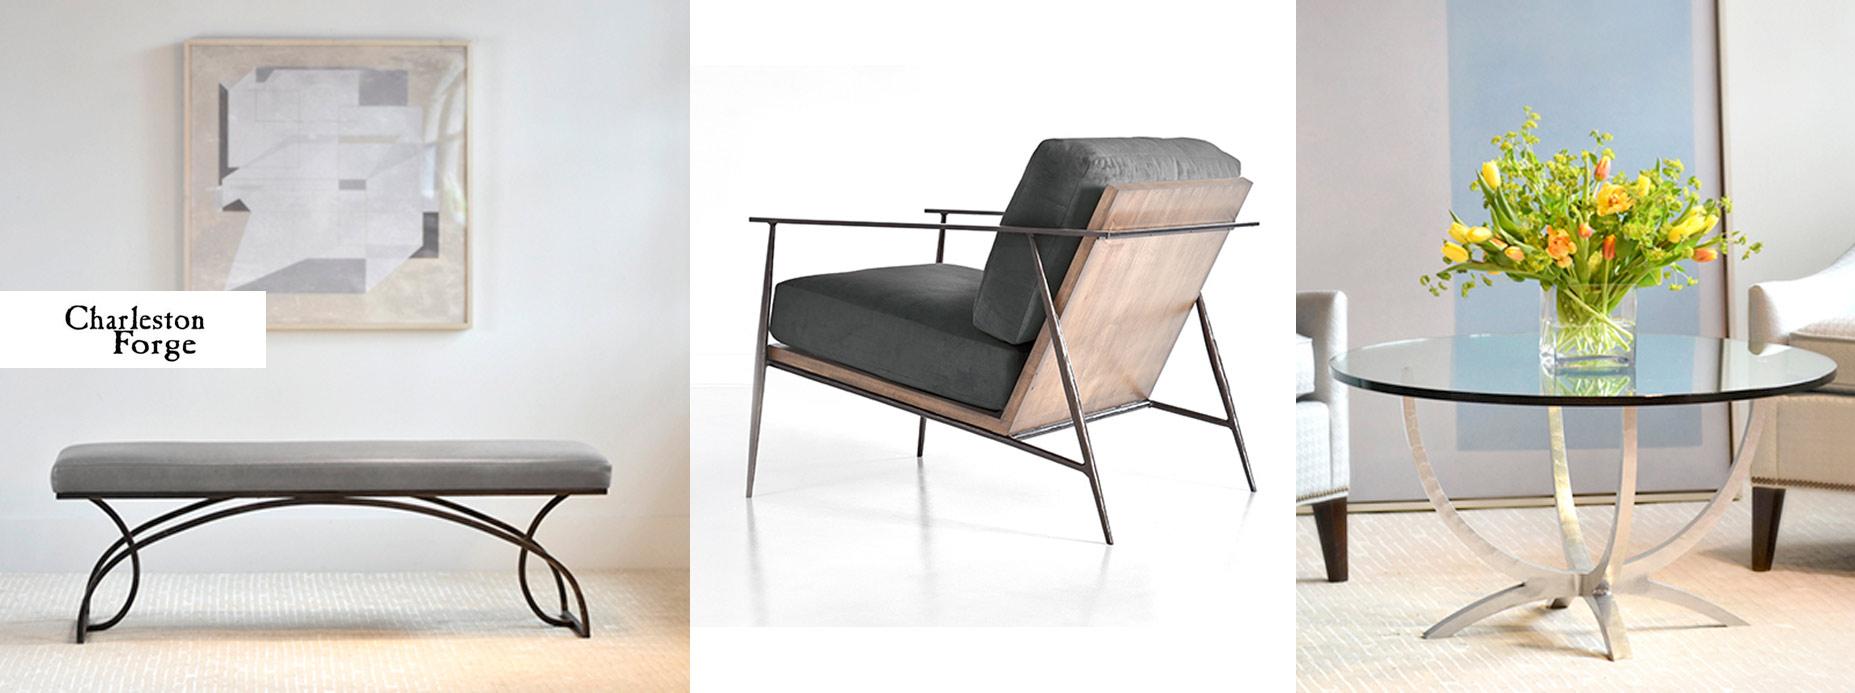 Etonnant Hickory Park Furniture